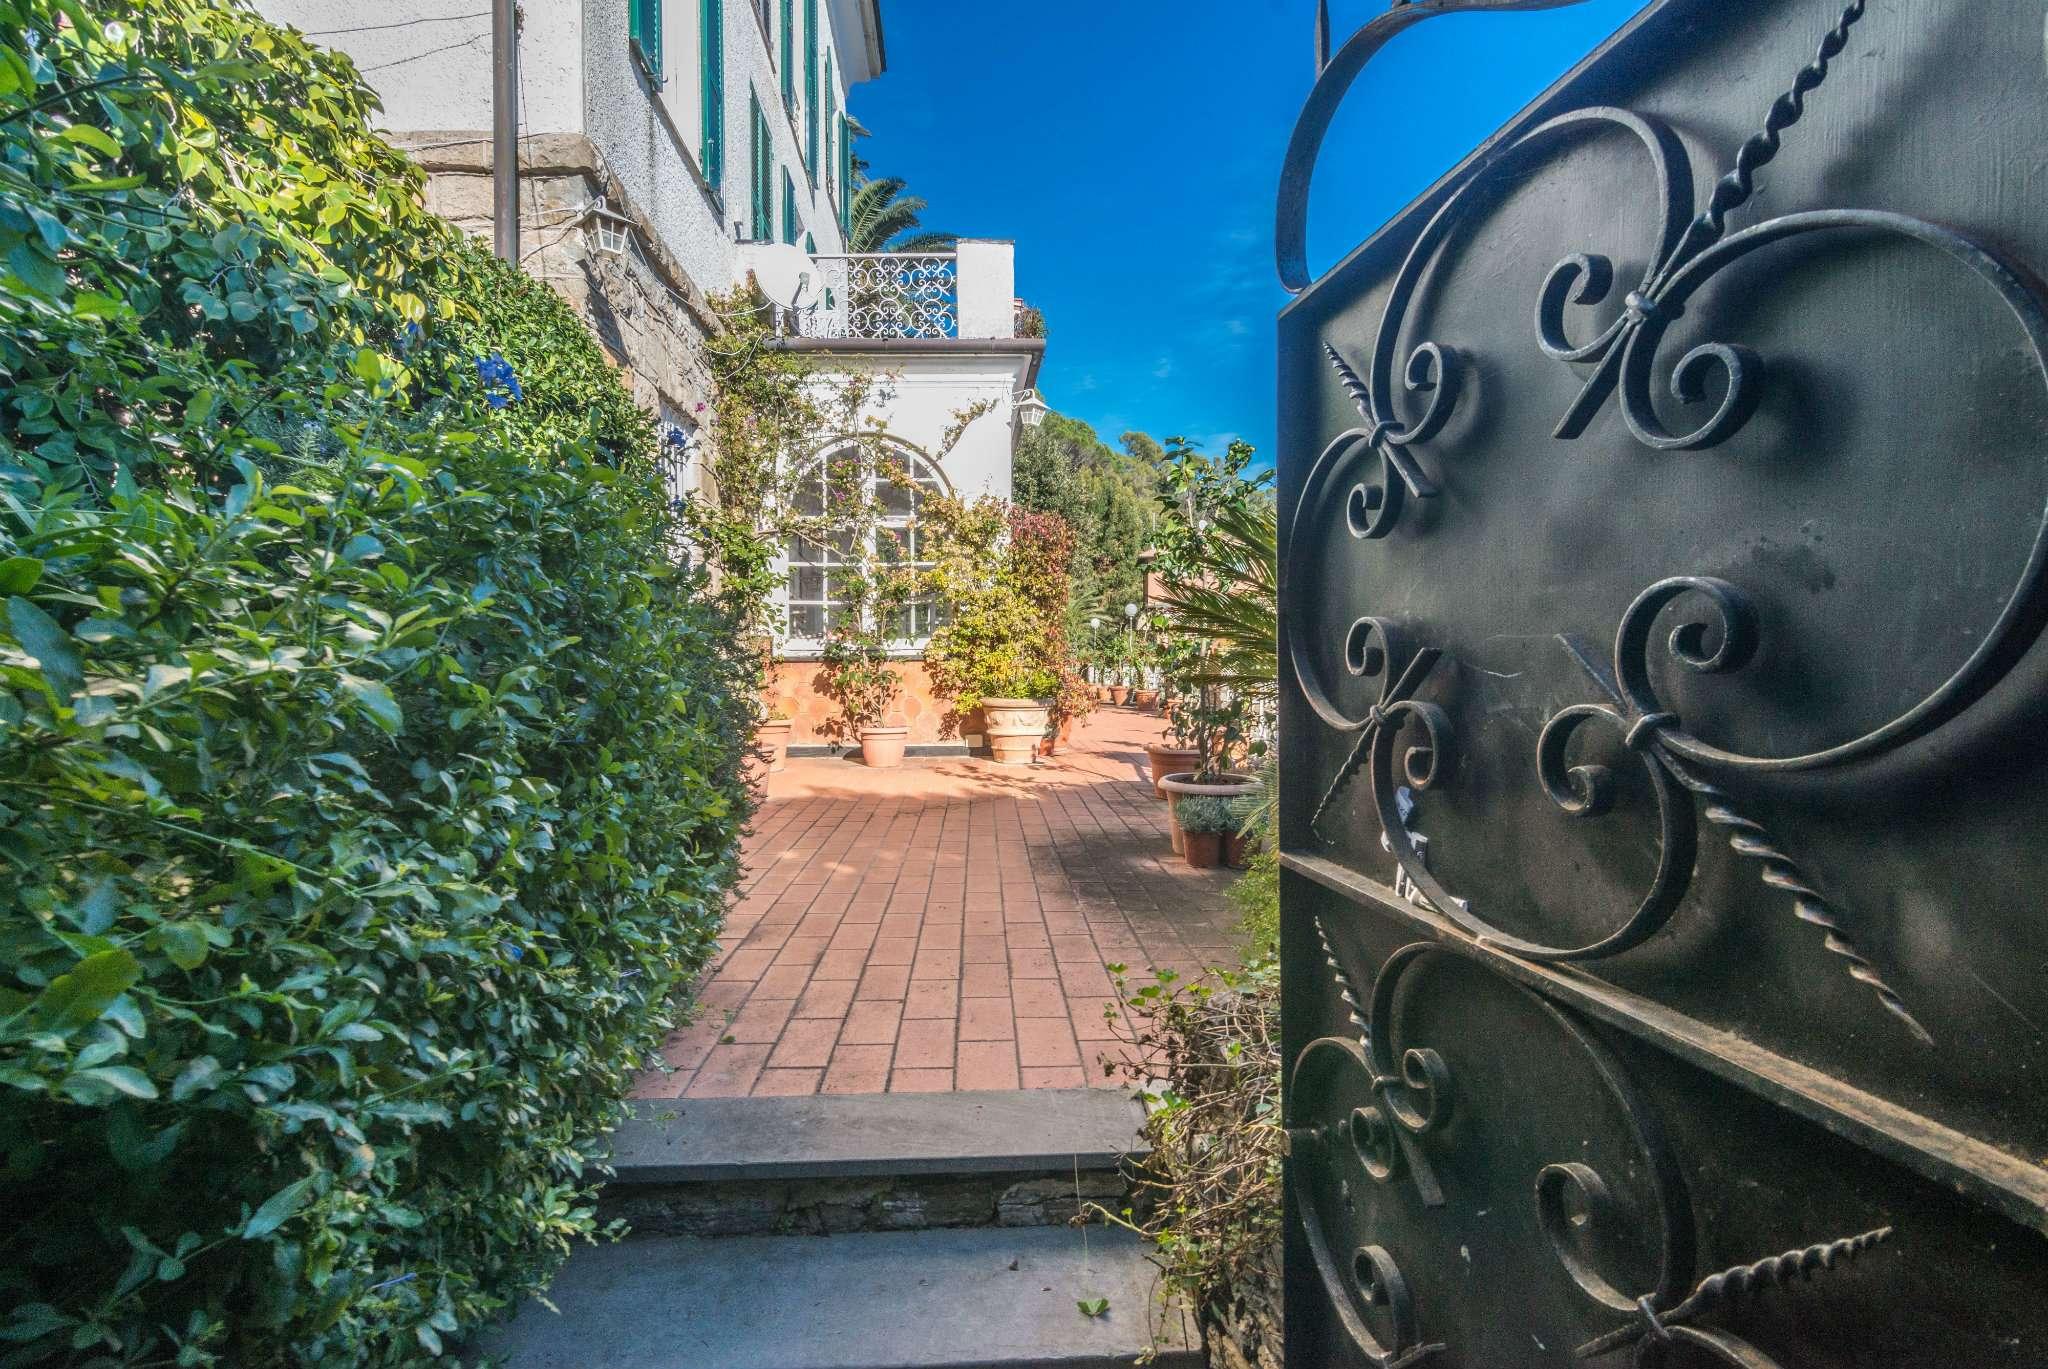 Villa in Vendita a Santa Margherita Ligure: 5 locali, 545 mq - Foto 10